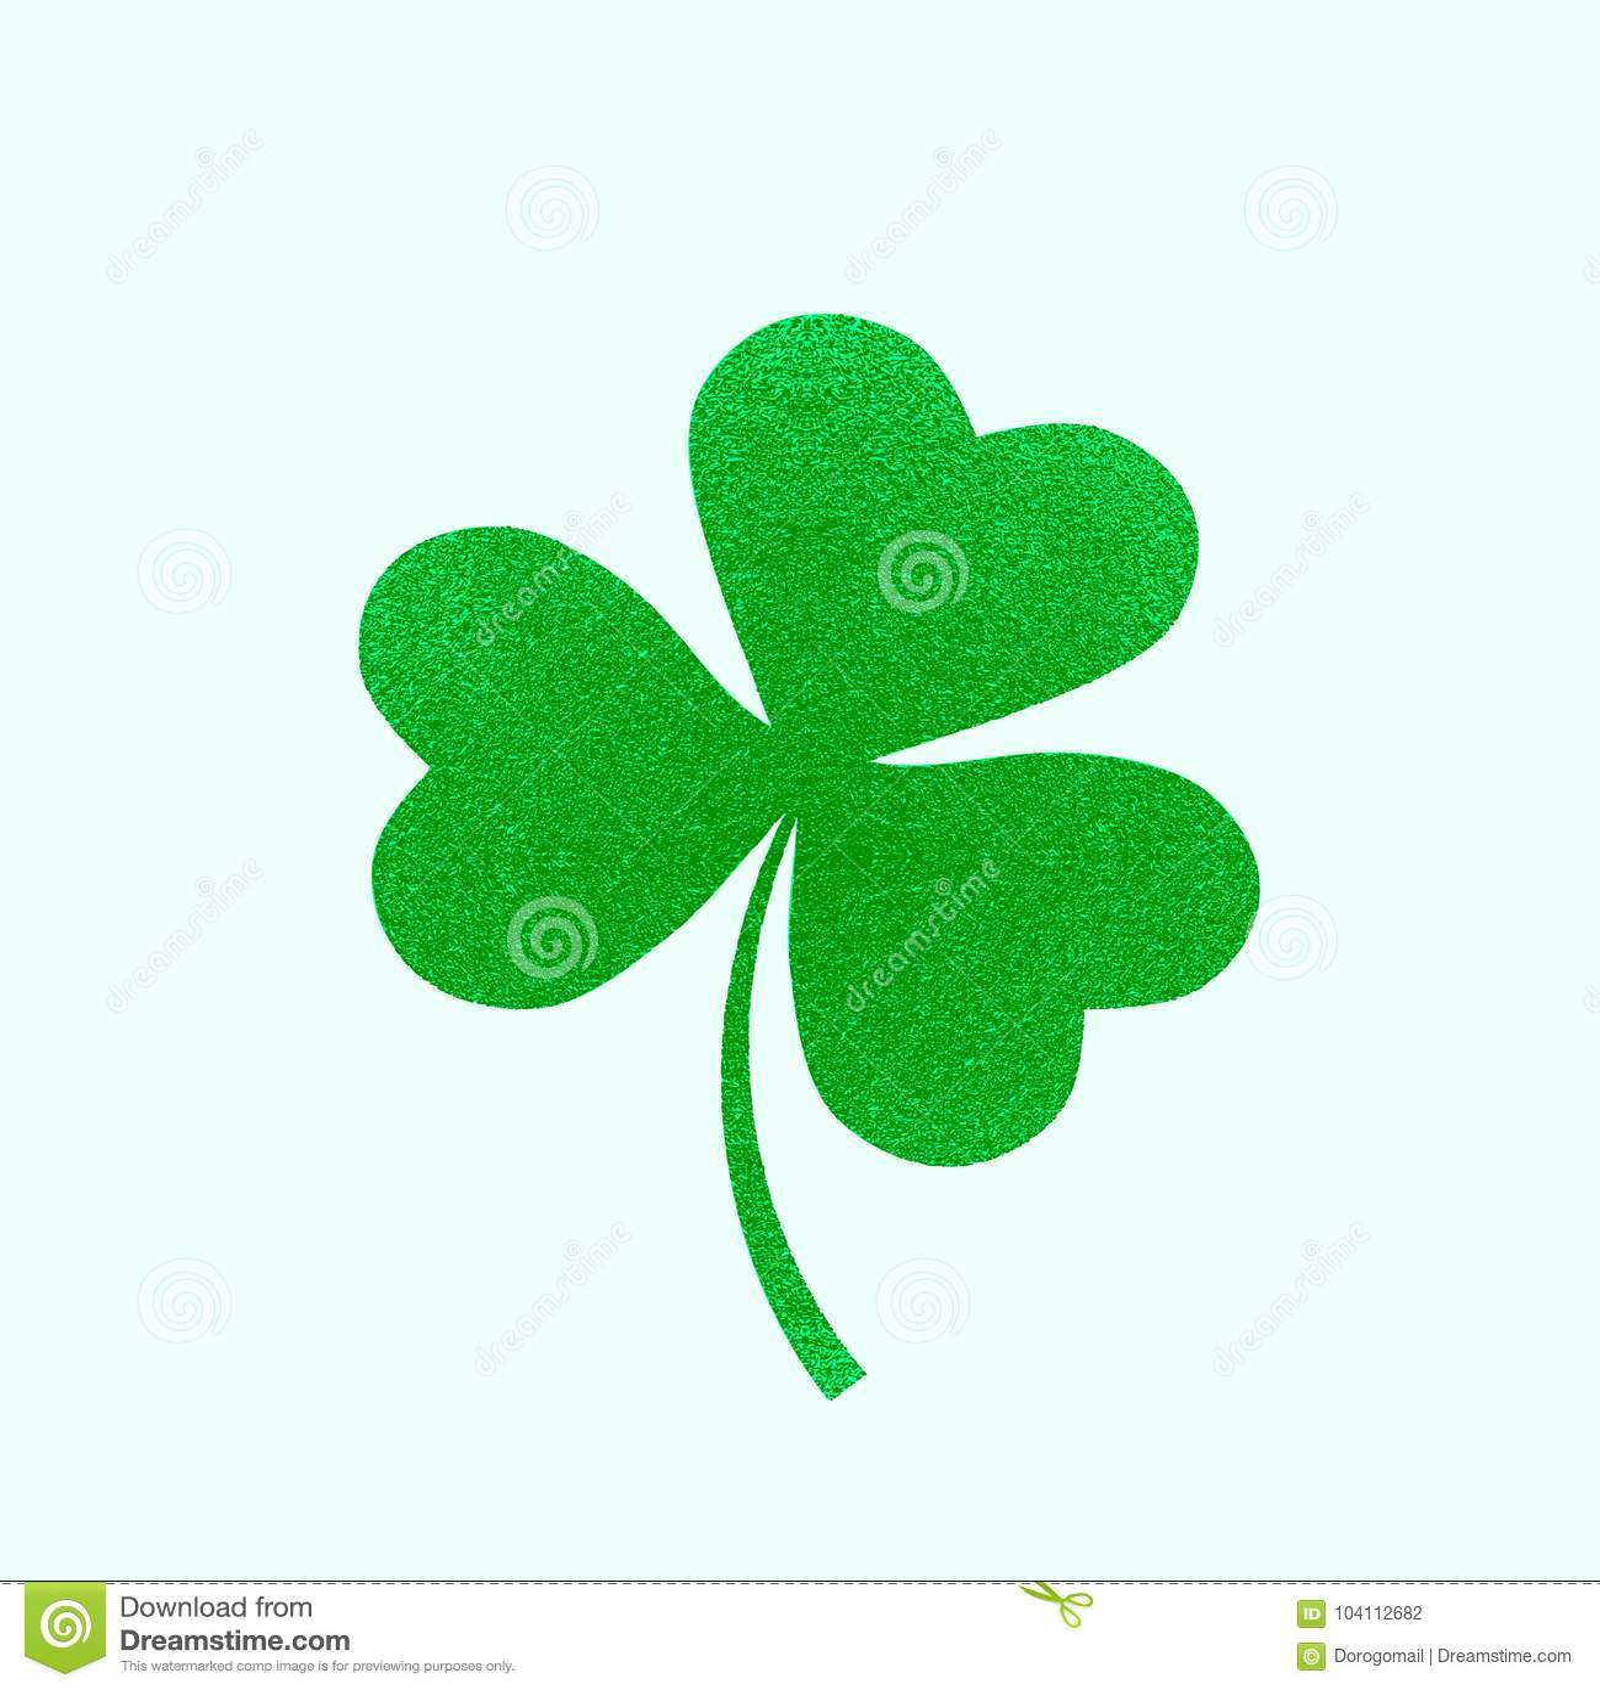 Irish holiday saint patricks day leaves clover vector irish holiday saint patricks day leaves clover vector illustration irish shamrock biocorpaavc Gallery